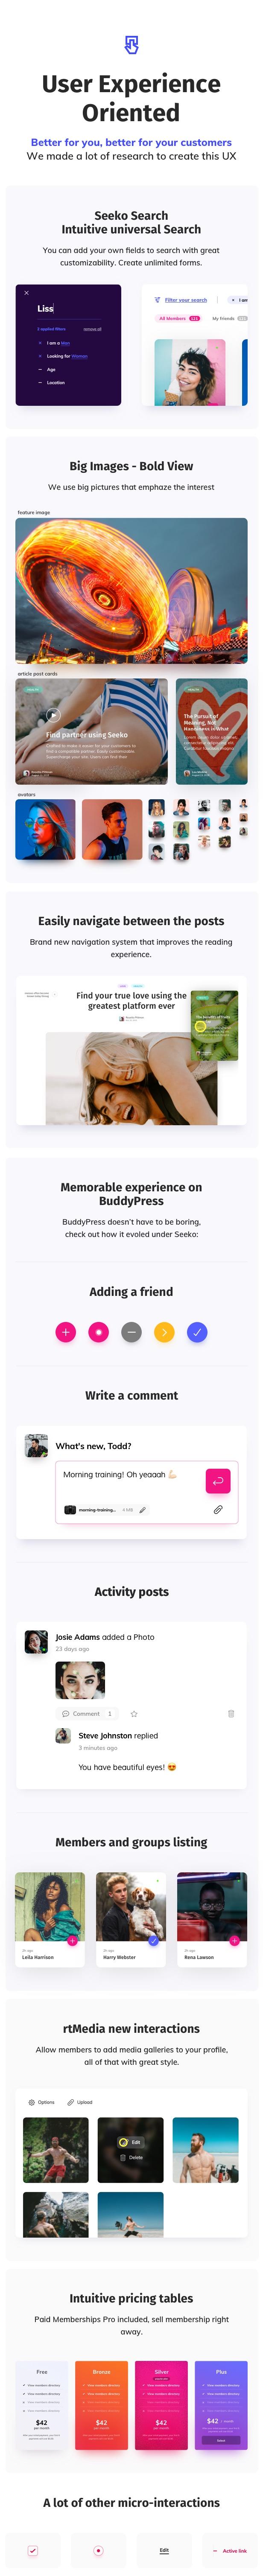 Seeko - Community Site Builder with BuddyPress SuperPowers - 10